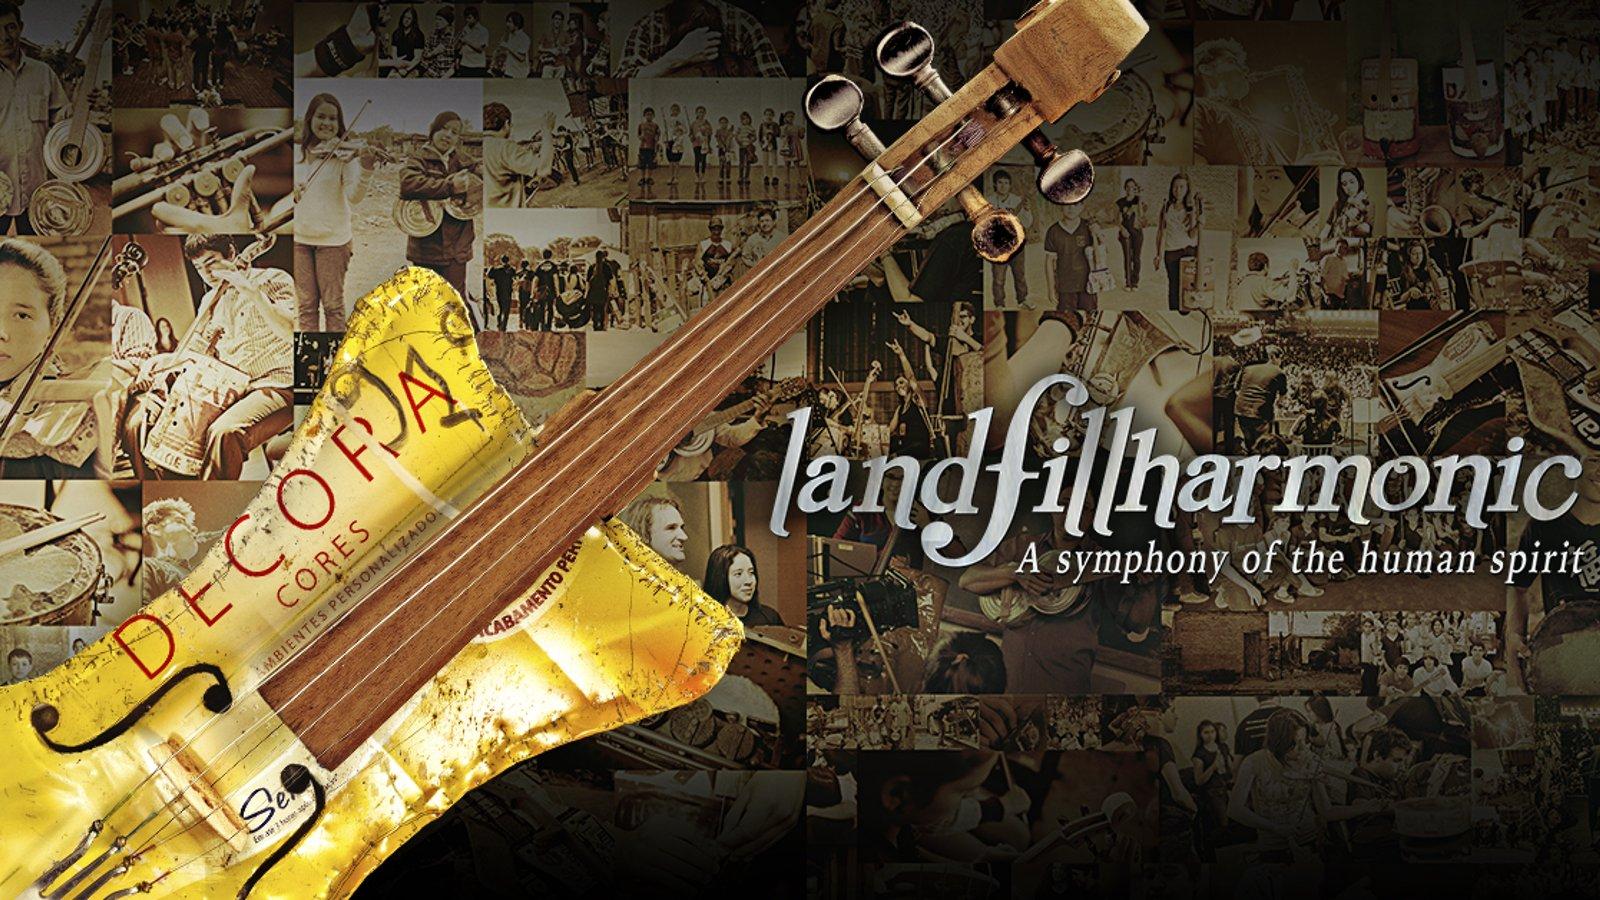 Landfill Harmonic - A Symphony of the Human Spirit